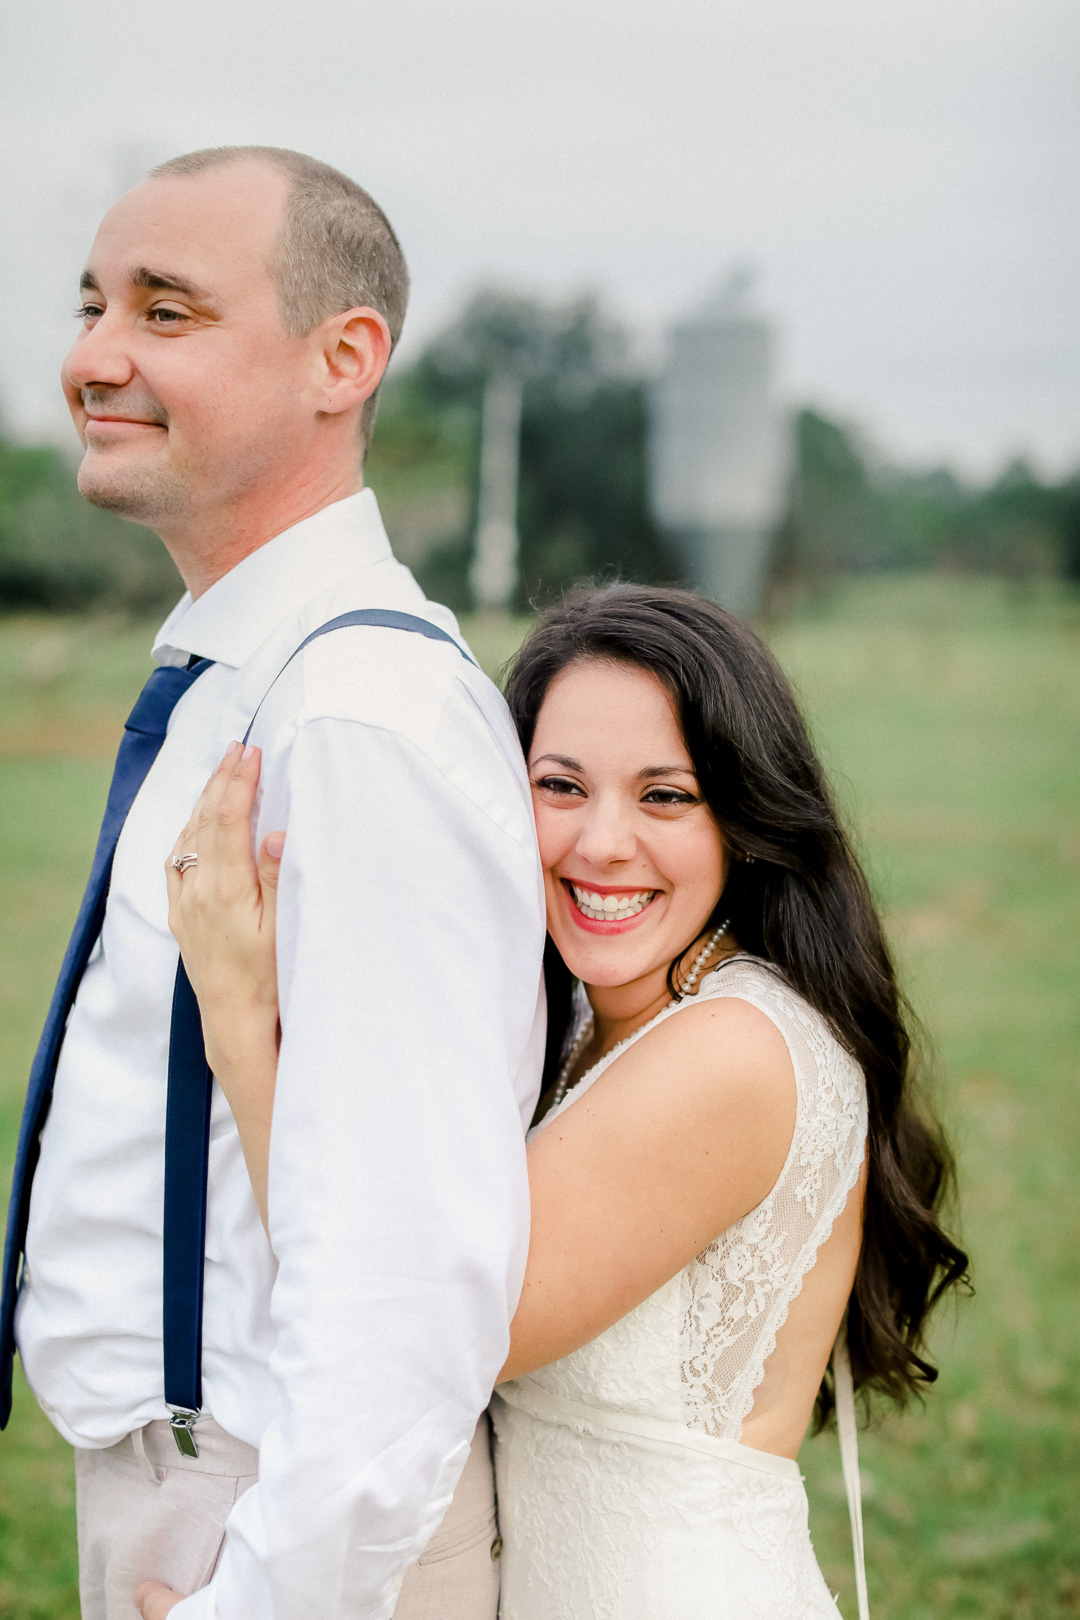 williams_family_newlywed-167.jpg